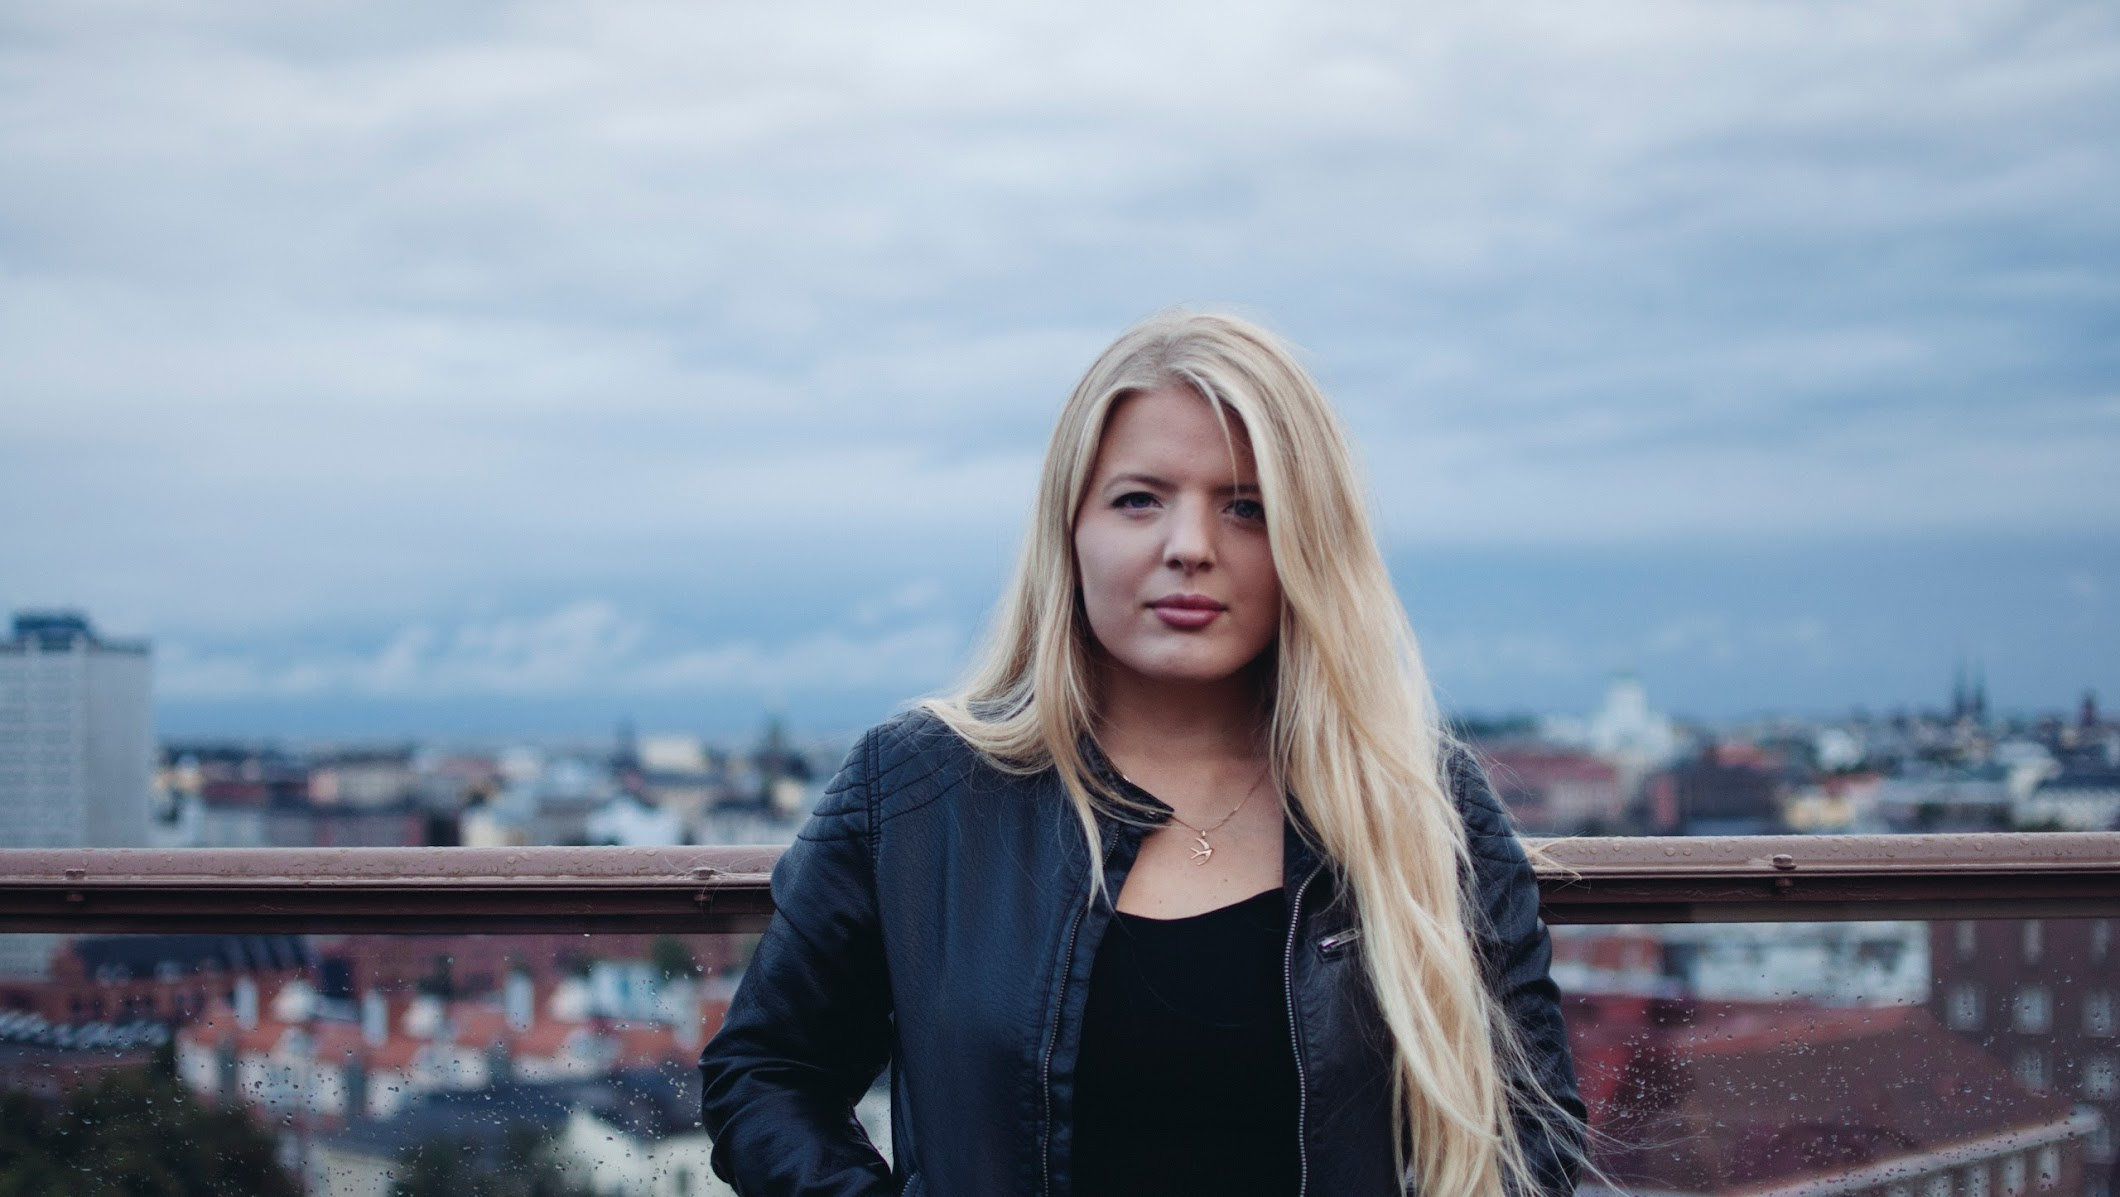 Maria Volmer